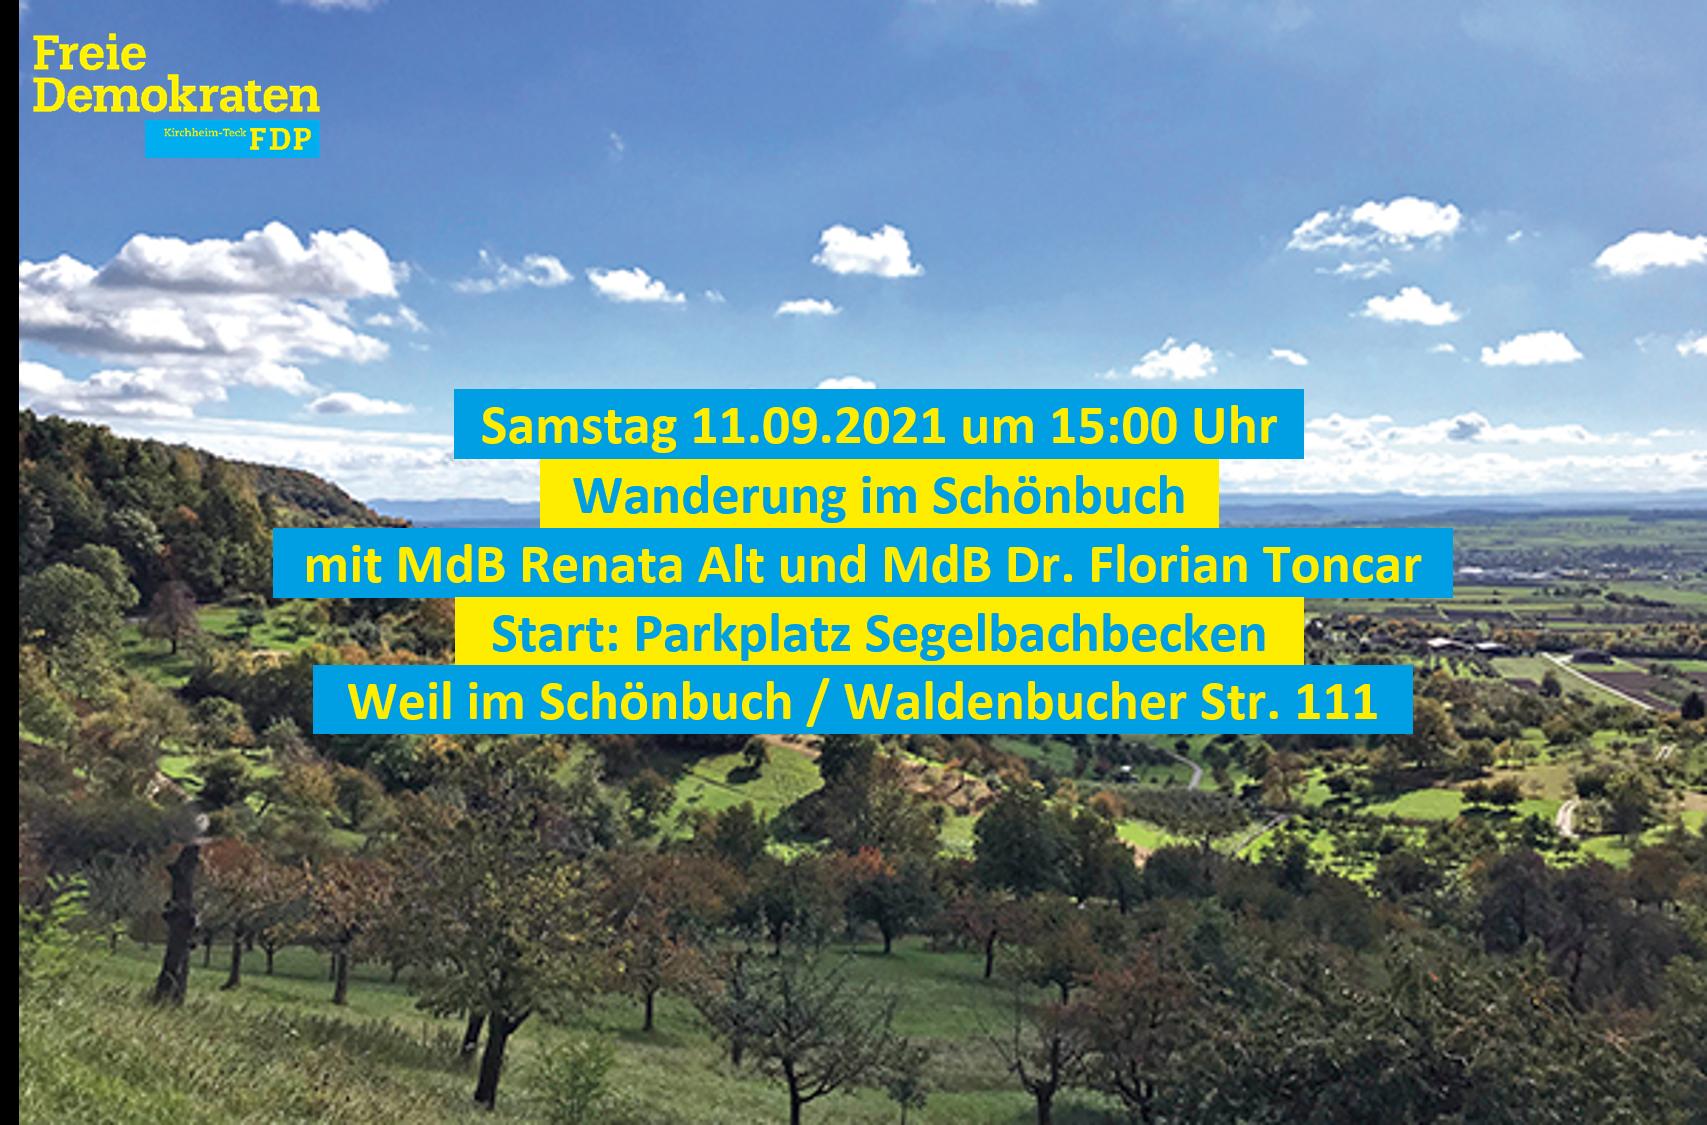 Veranstaltung mit Renata Alt und Dr. Florian Toncar